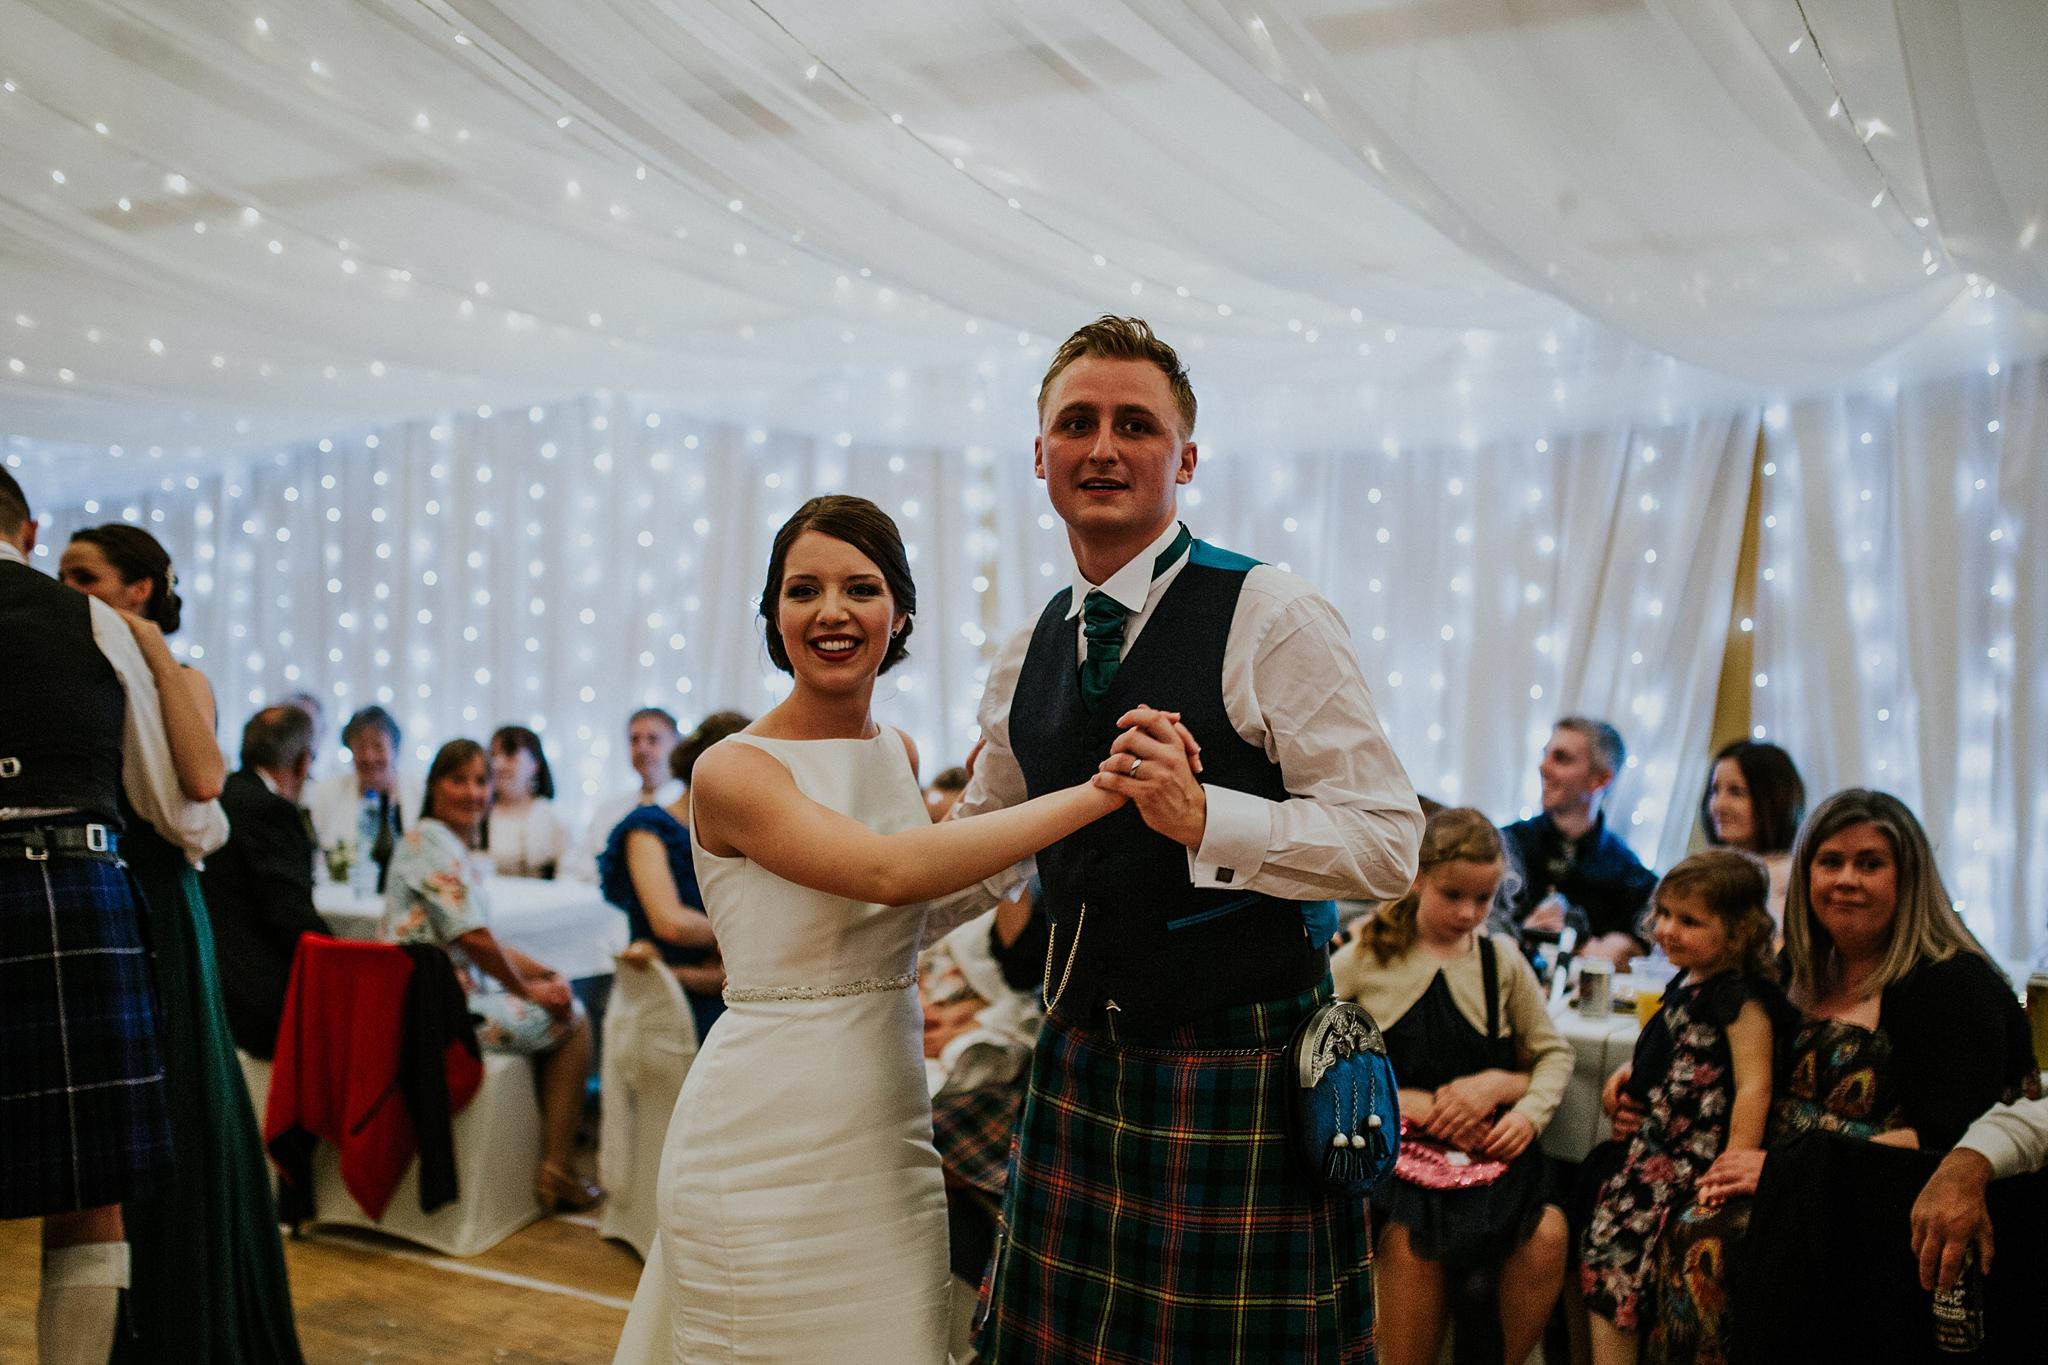 Linda&Shockie_northuist_wedding_photographer-62.JPG